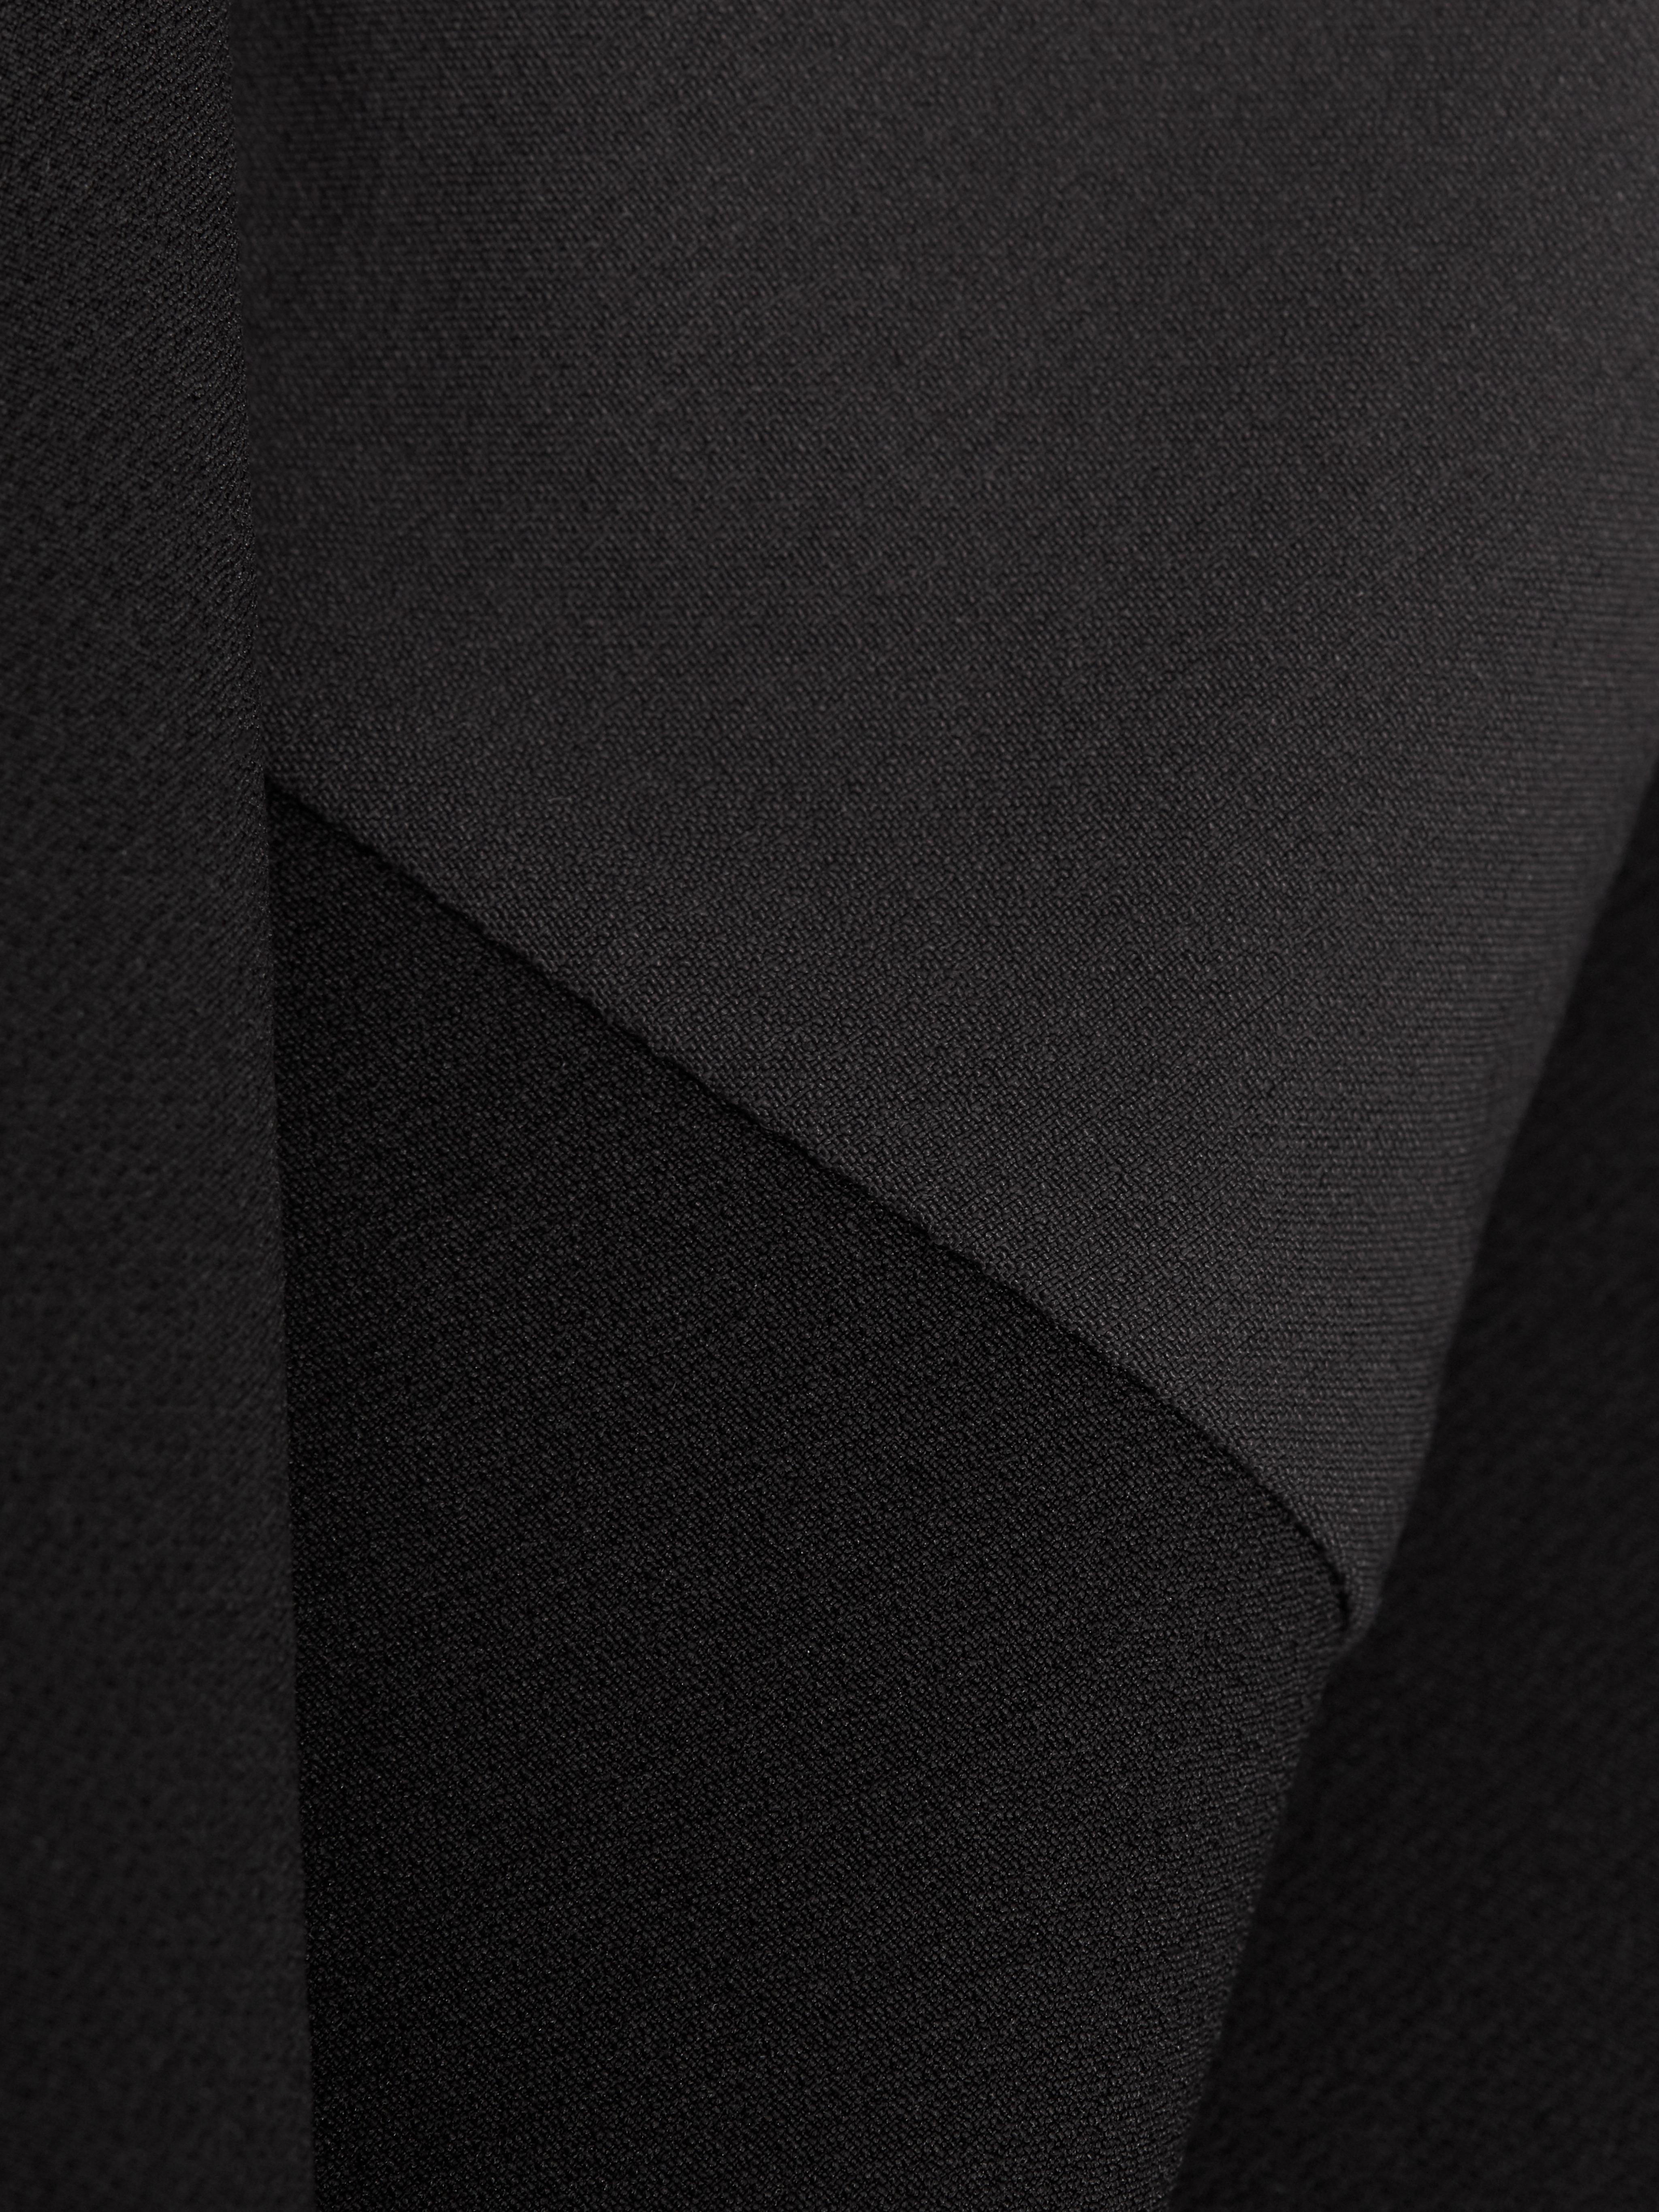 Courmayeur SO Pants Women product image